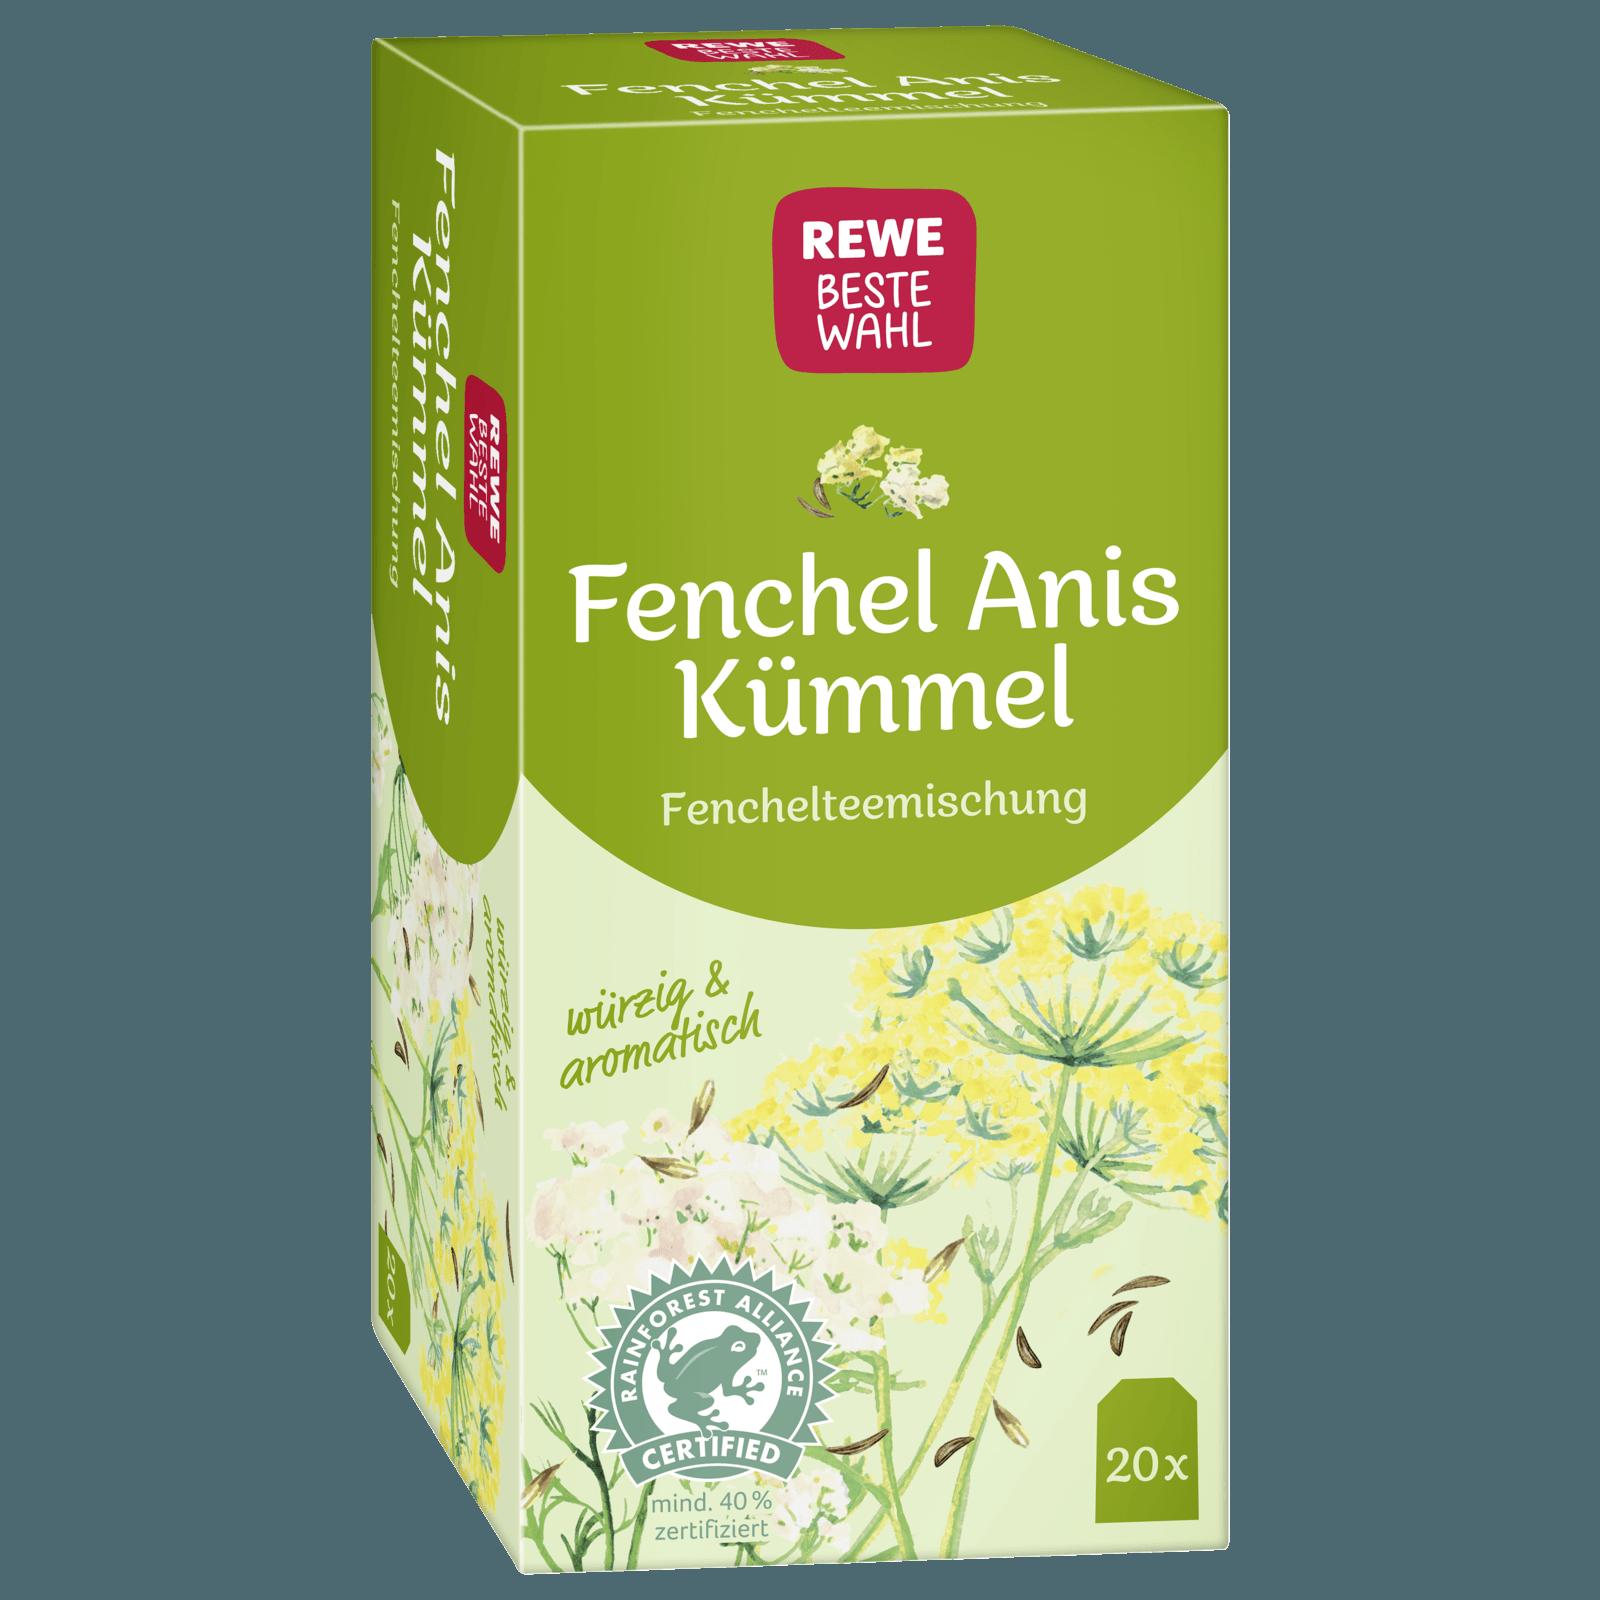 REWE Beste Wahl Kräutertee Fenchel-Anis-Kümmel 40g, 20 Beutel